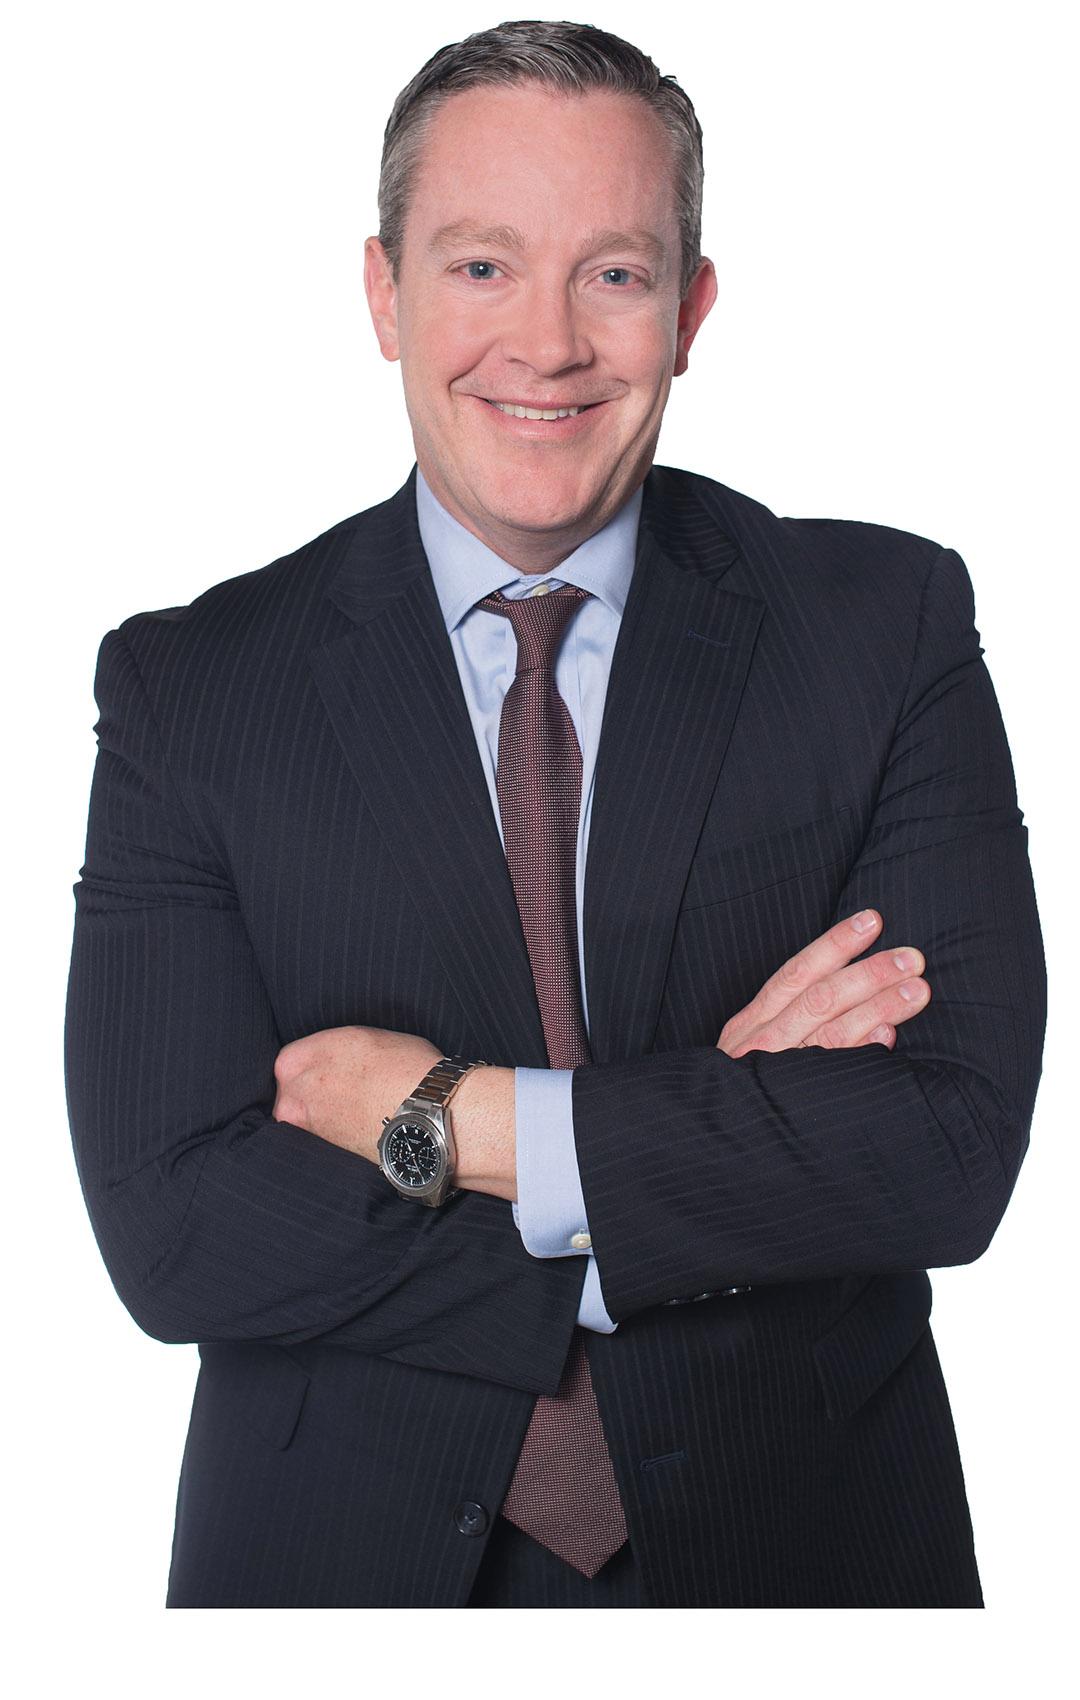 Mark T. Clouatre